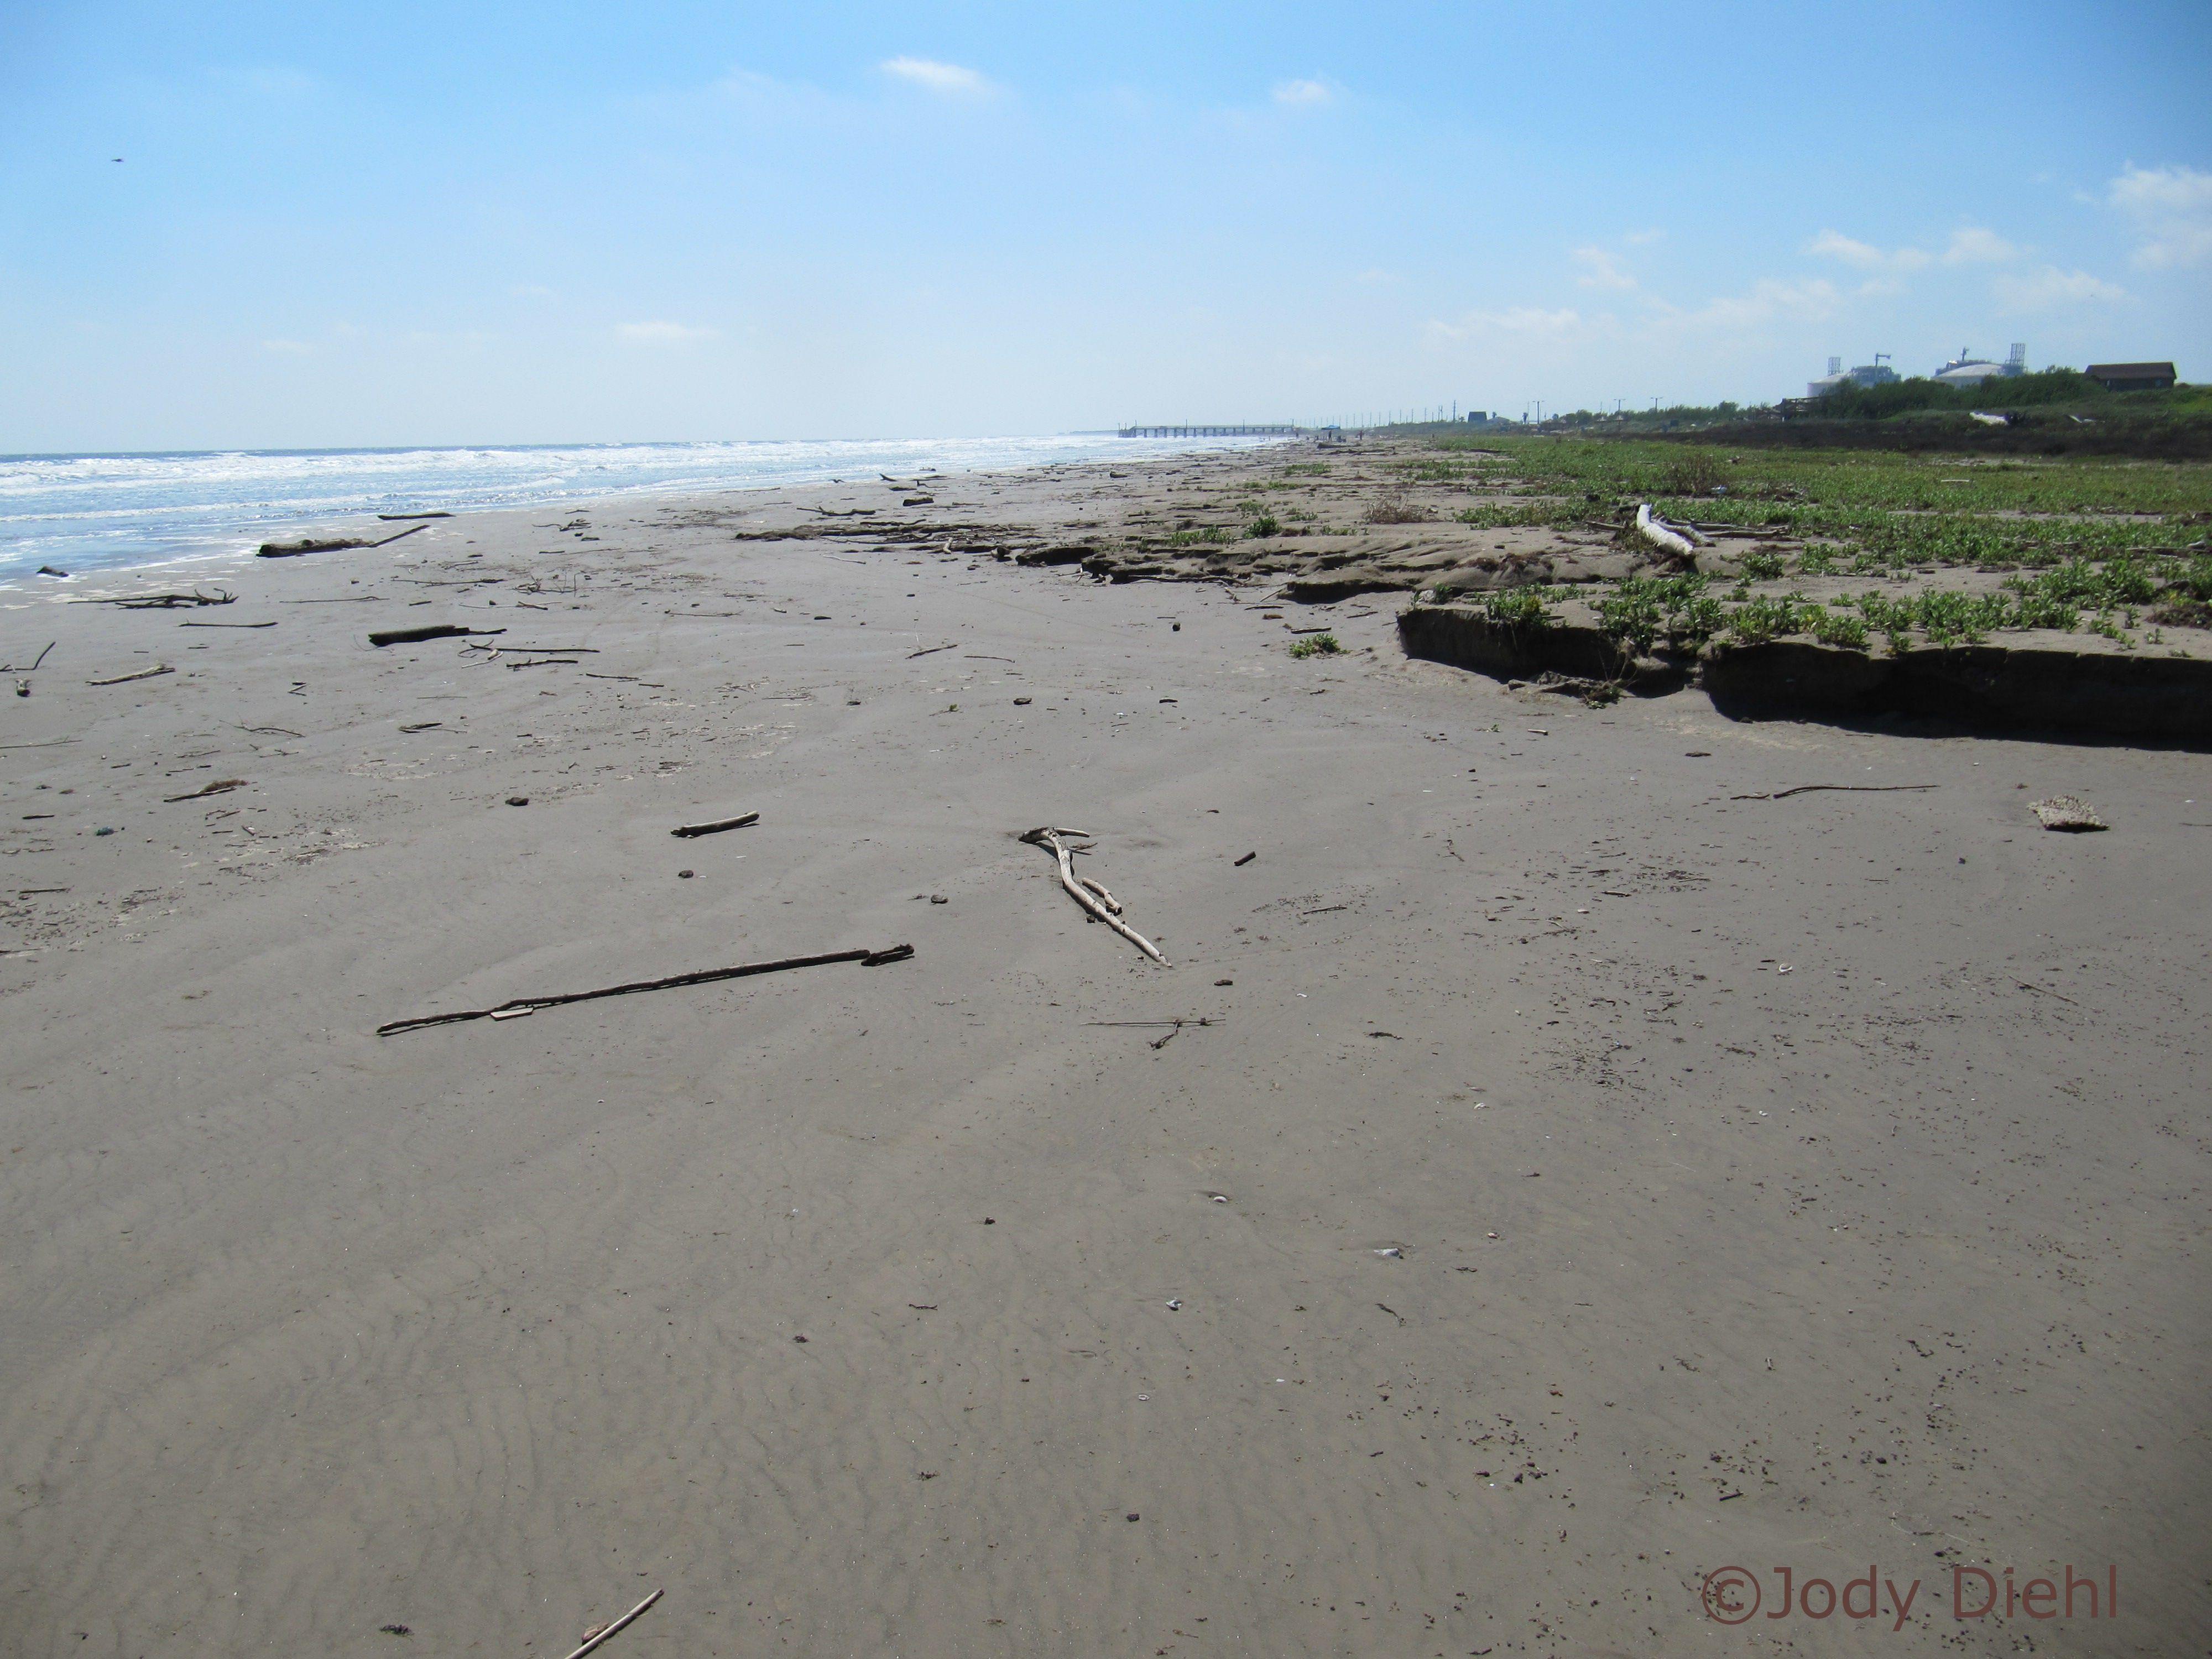 Beachcombing On Texas Gulf Coast